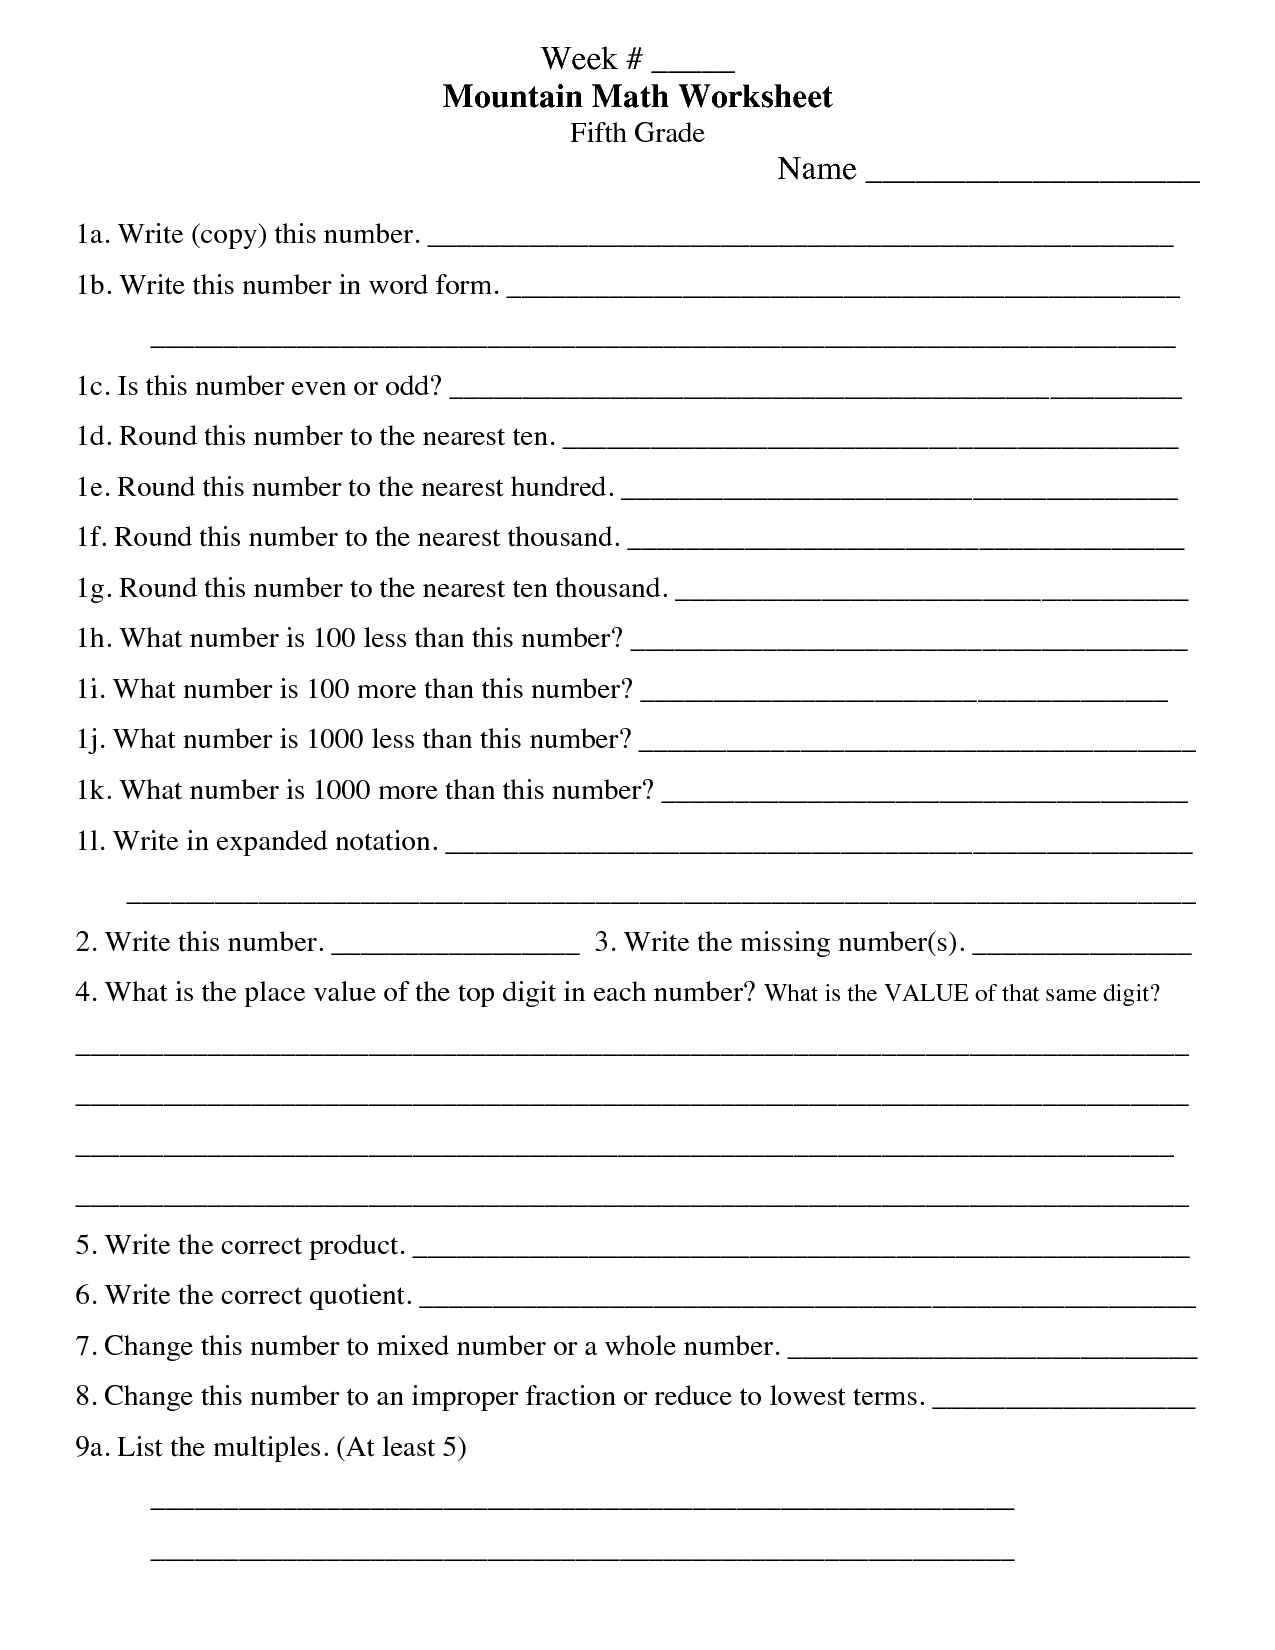 Mountain Math 4th Grade Worksheet